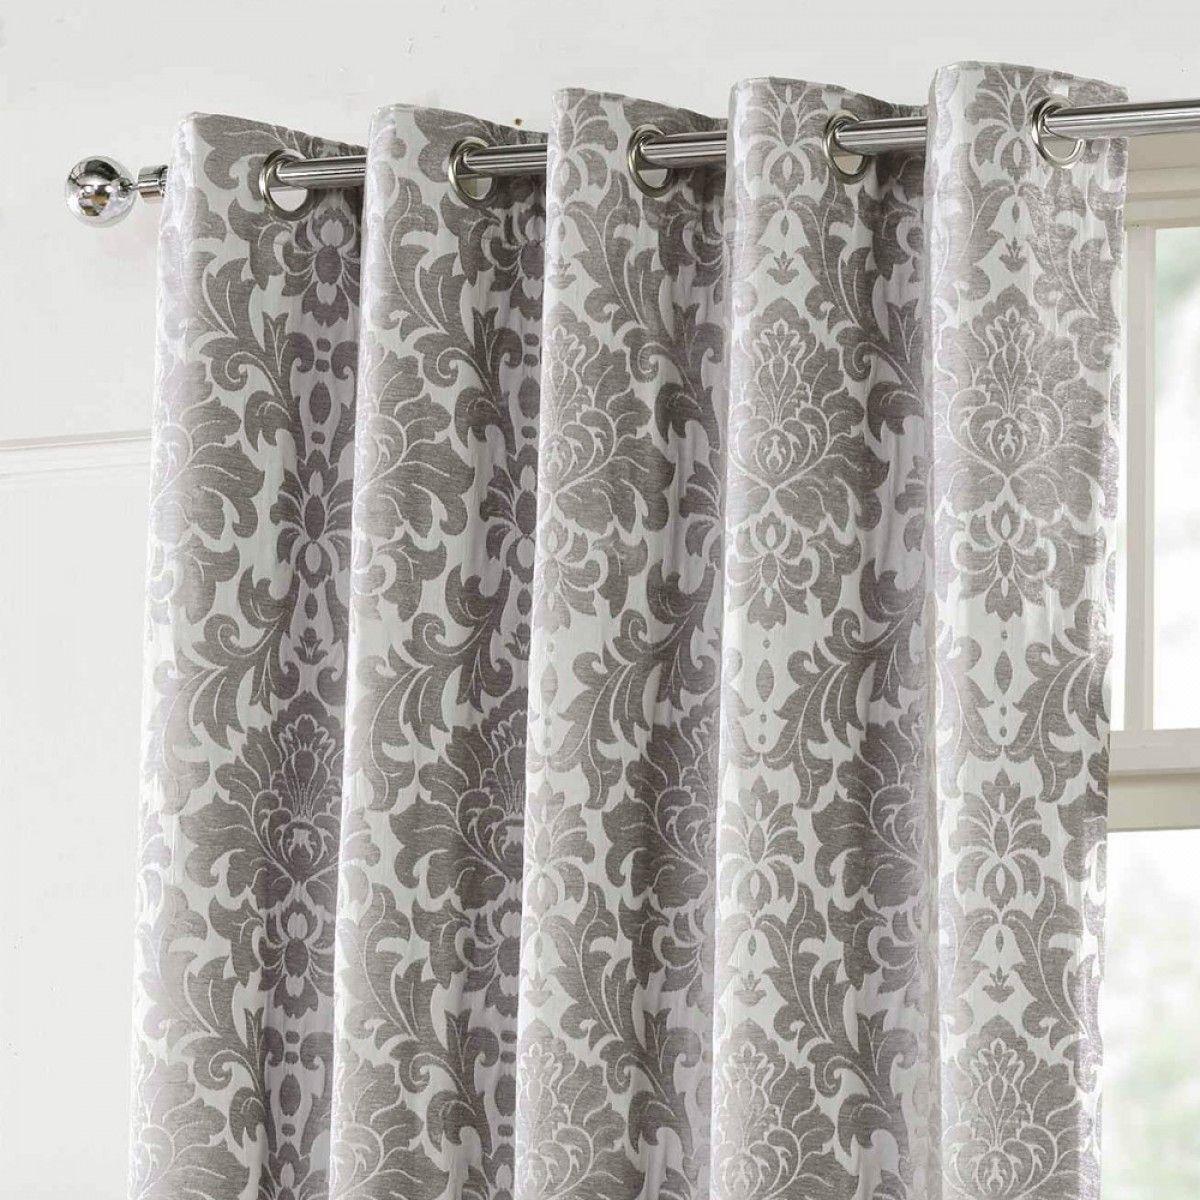 Camden Damask Woven Chenille Lined Eyelet Curtains Silver Curtains Damask Damask Curtains